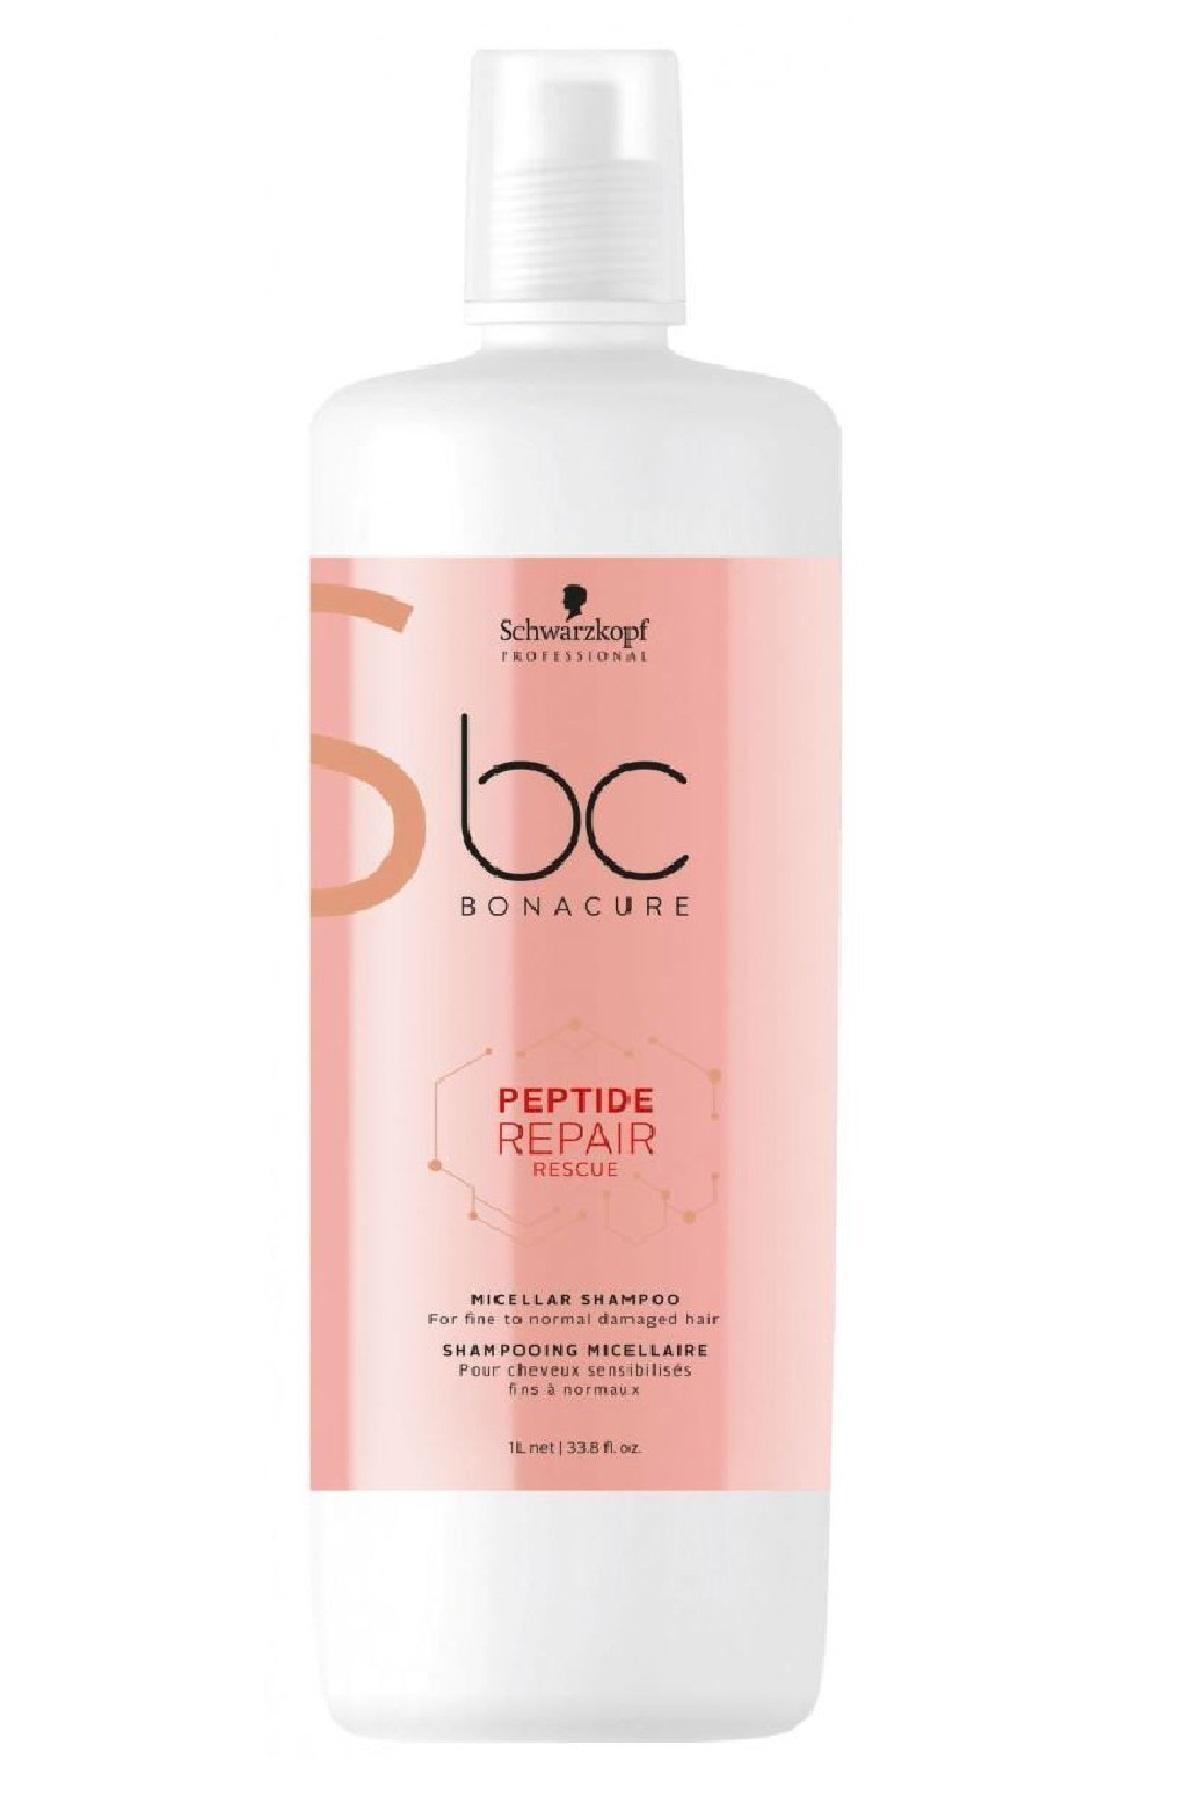 Bonacure Peptide Acil Kurtarma Micellar Şampuan 1000ml 1